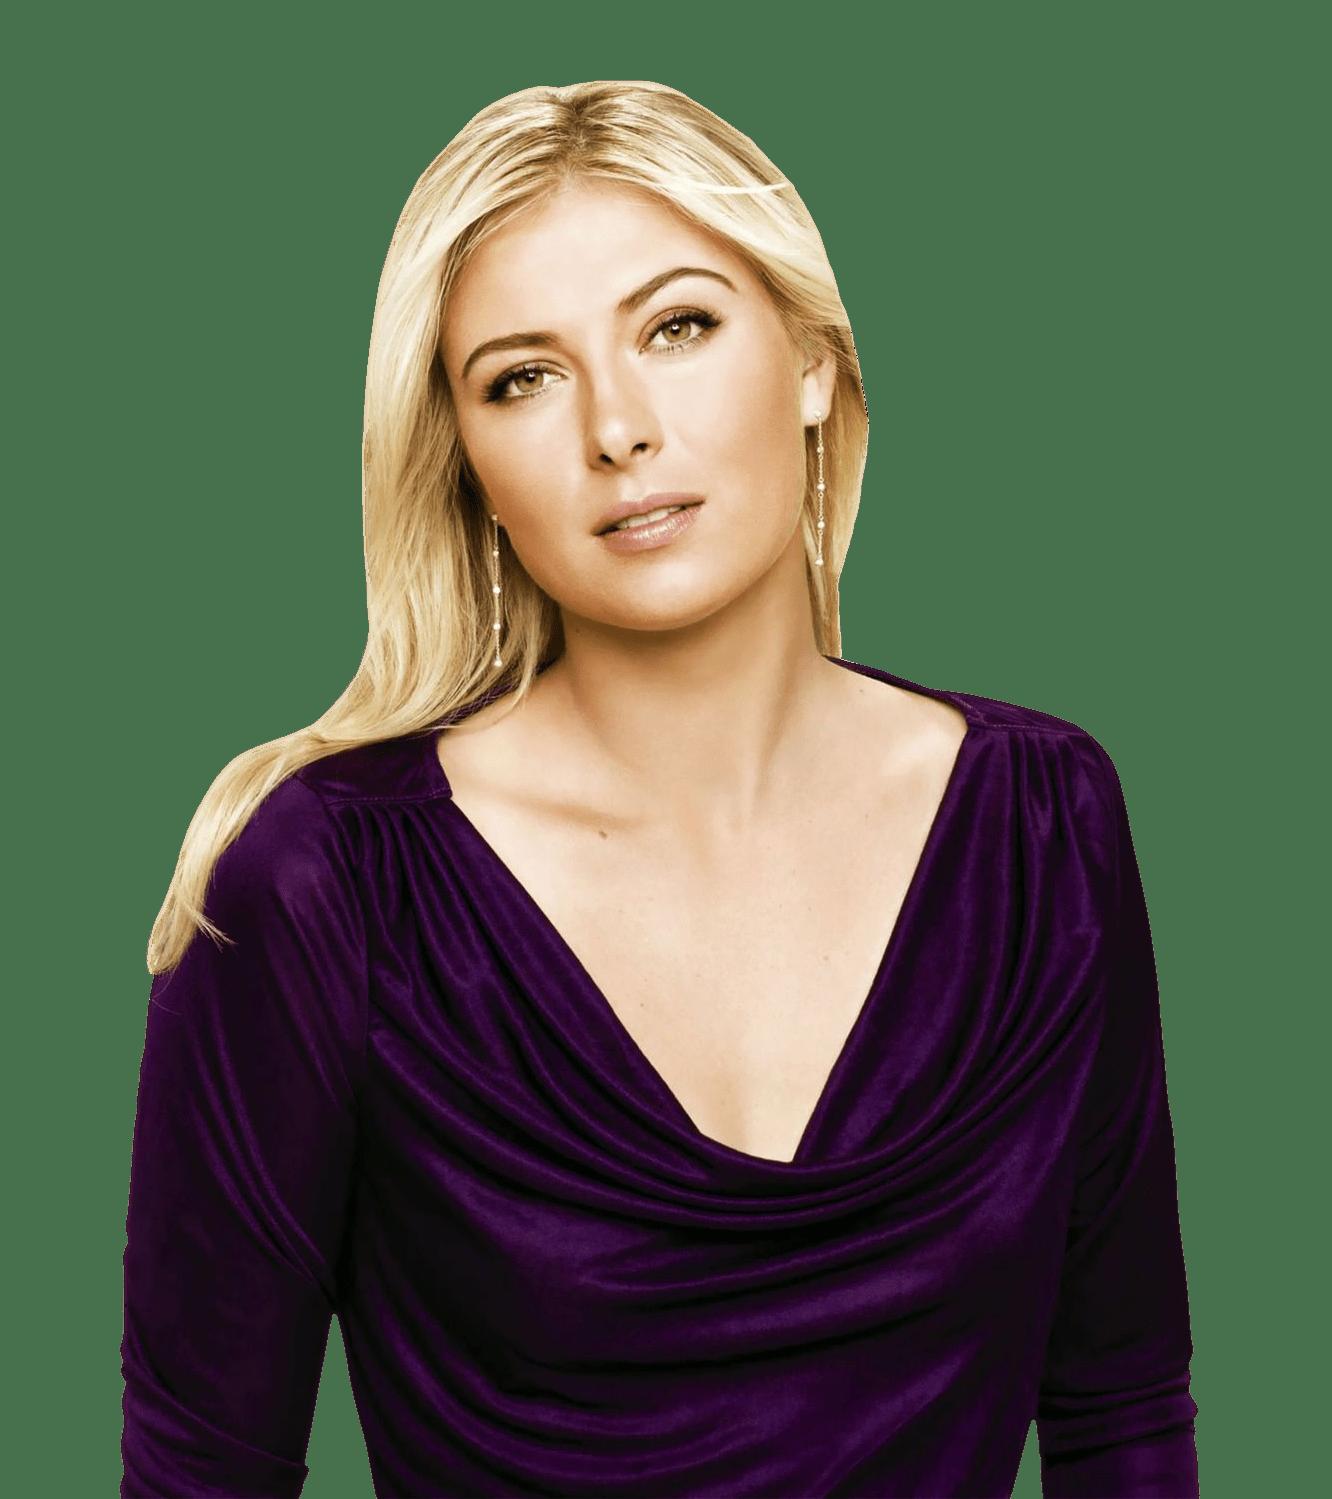 Maria sharapova clipart clip freeuse stock Maria Sharapova Purple Dress transparent PNG - StickPNG clip freeuse stock